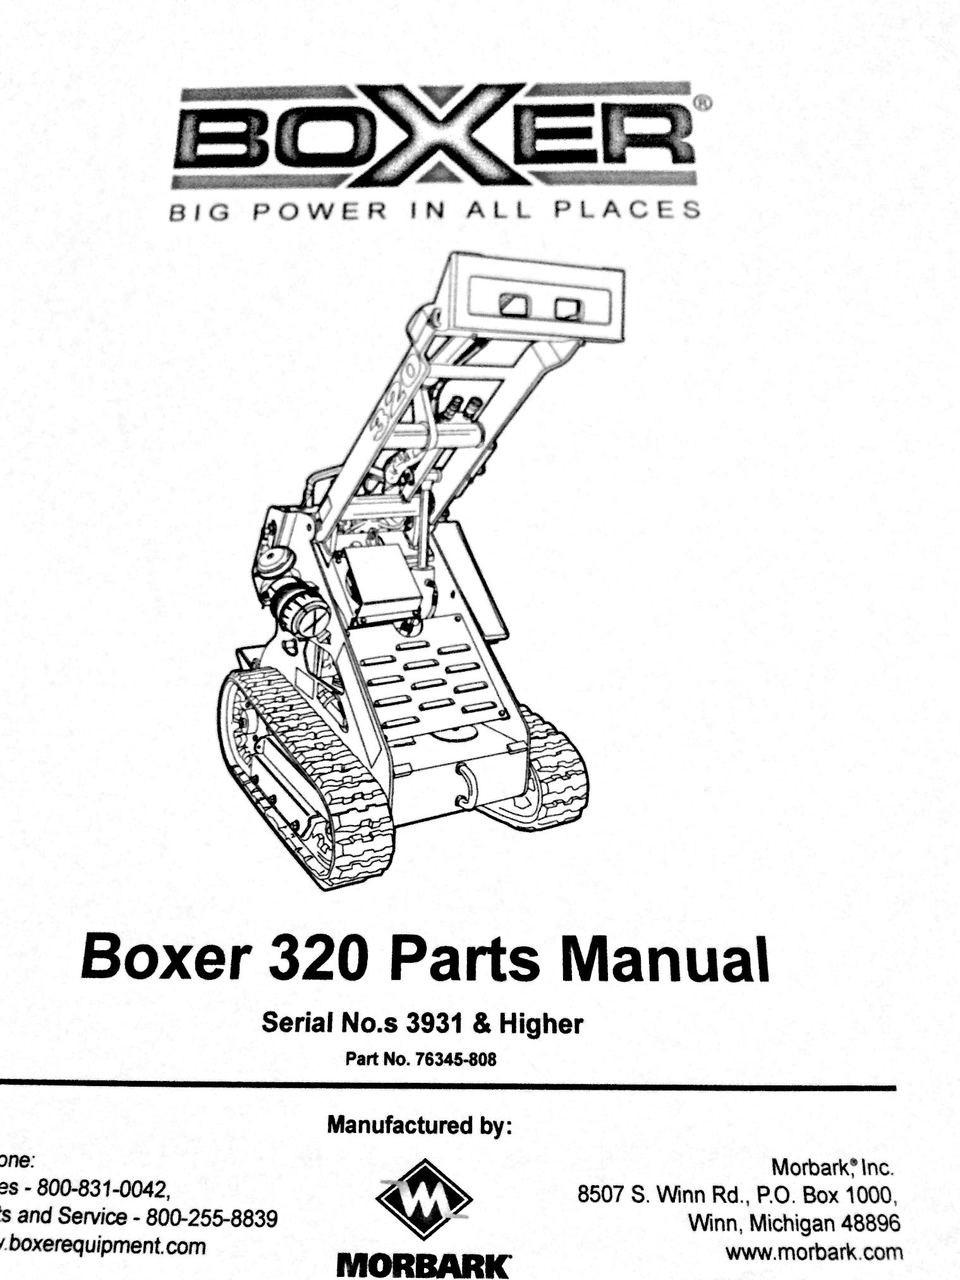 Boxer 320 Parts Manual Enviro Chipper Ind Inc Skateboard Diagram Image 1